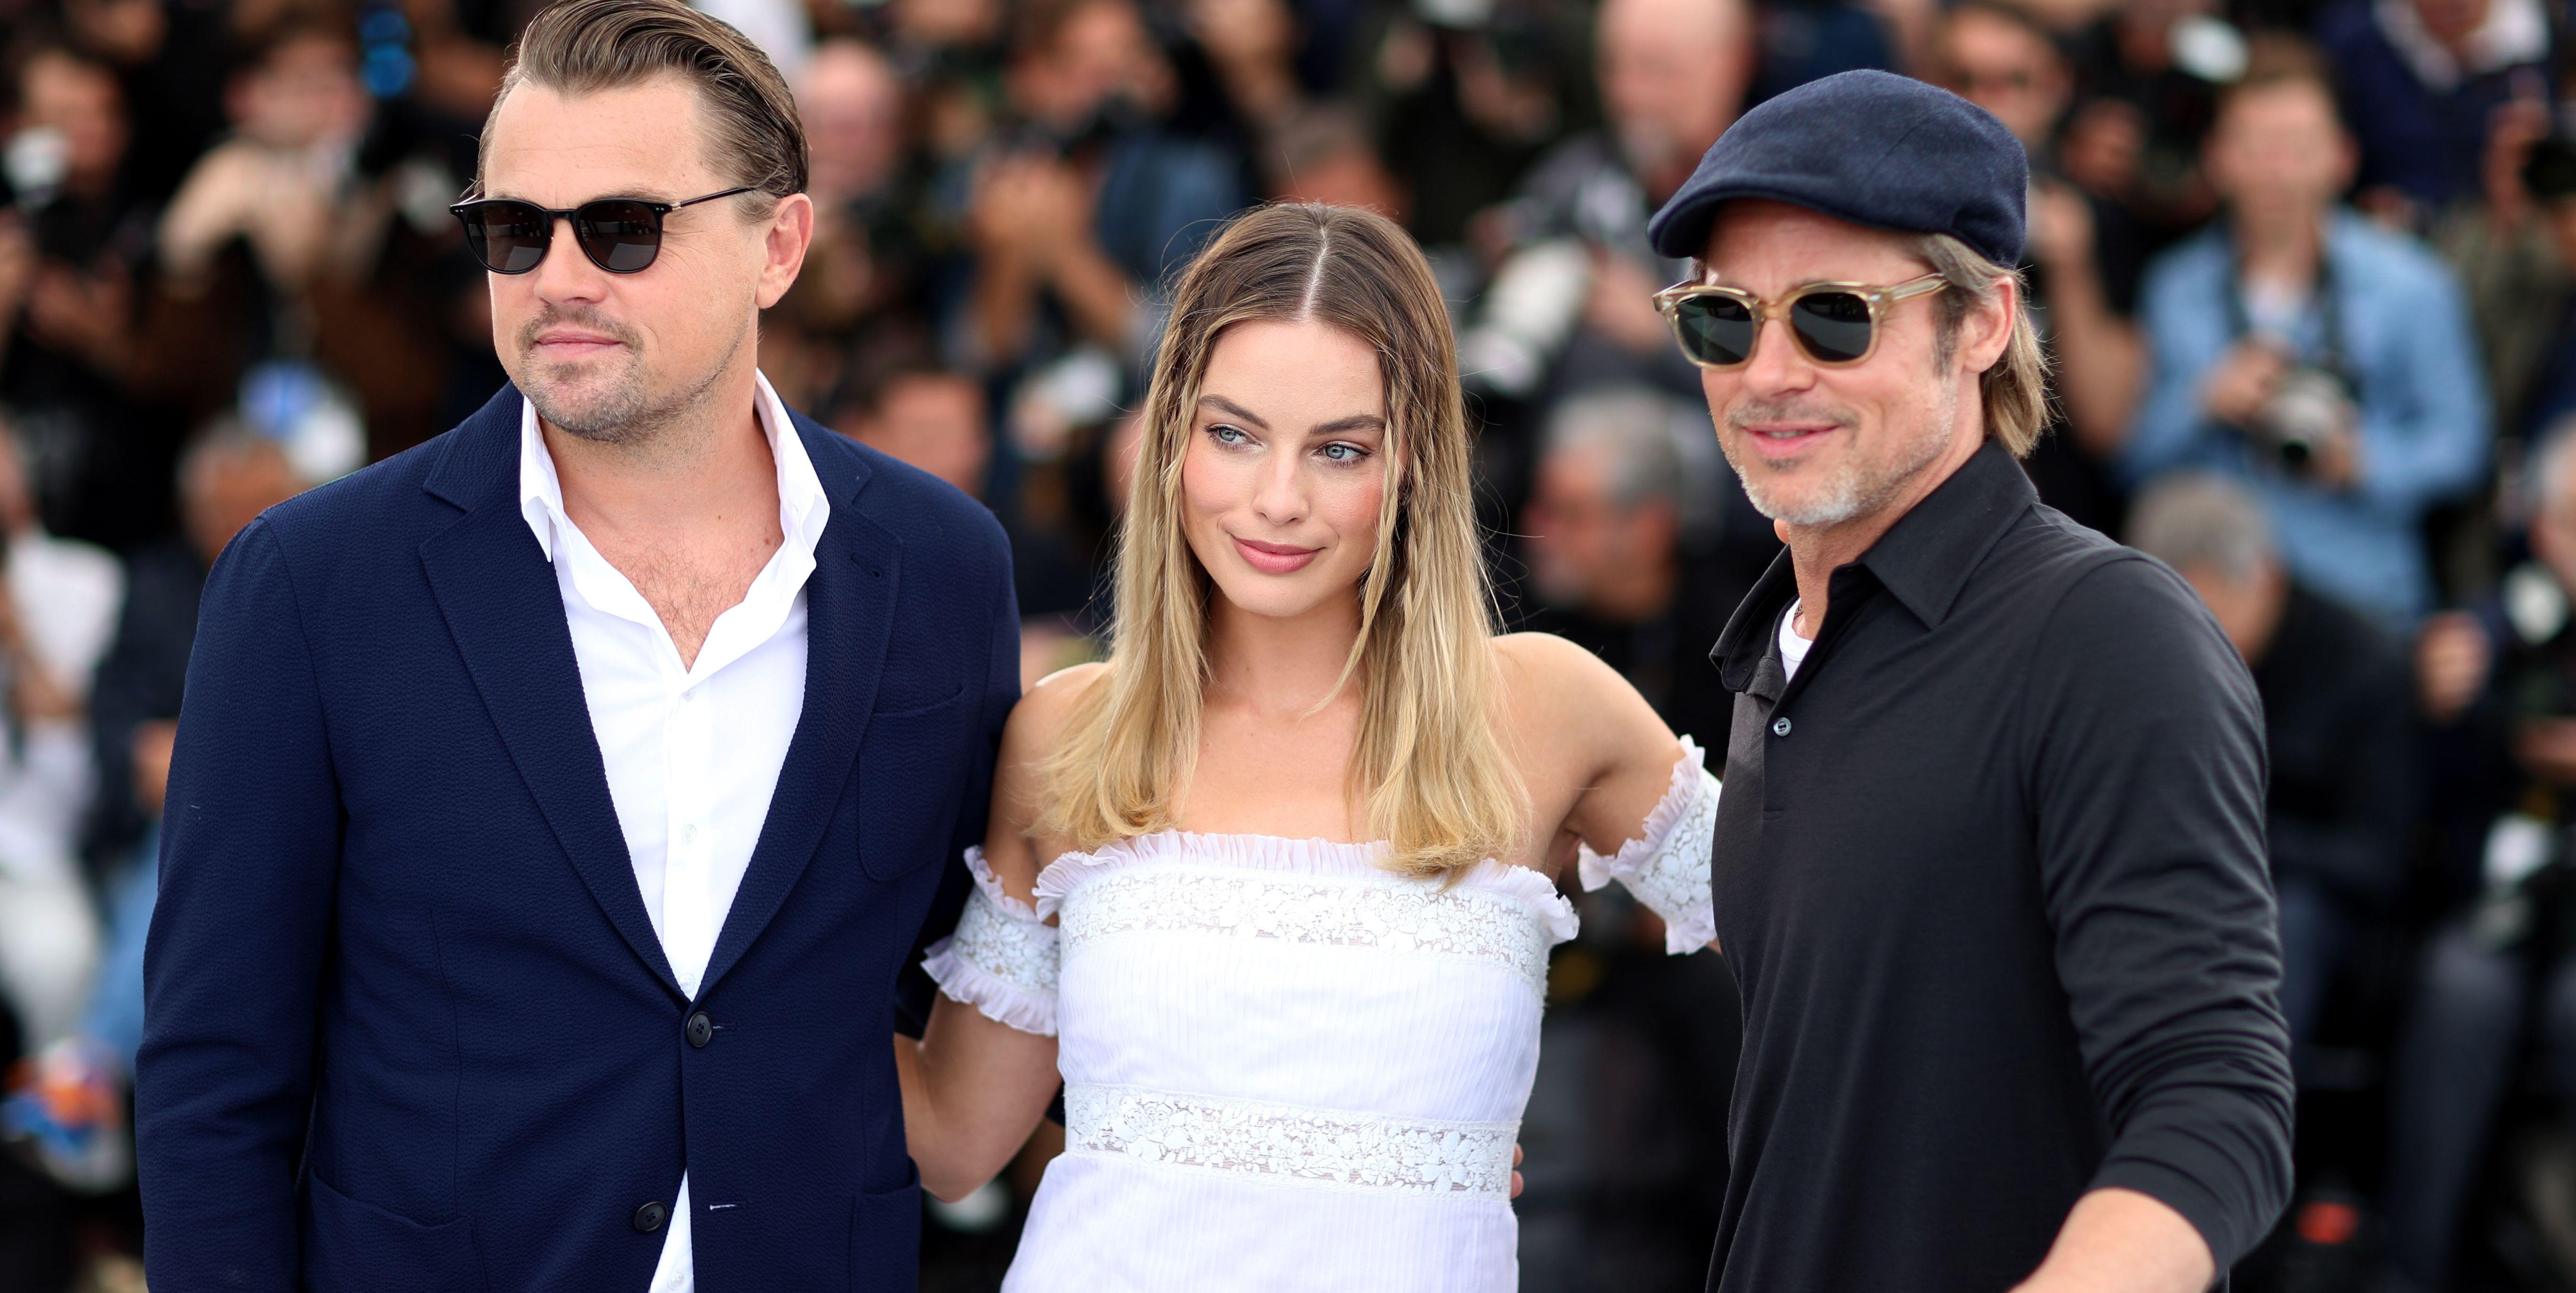 Cannes Film Festival 2019: all the fashion